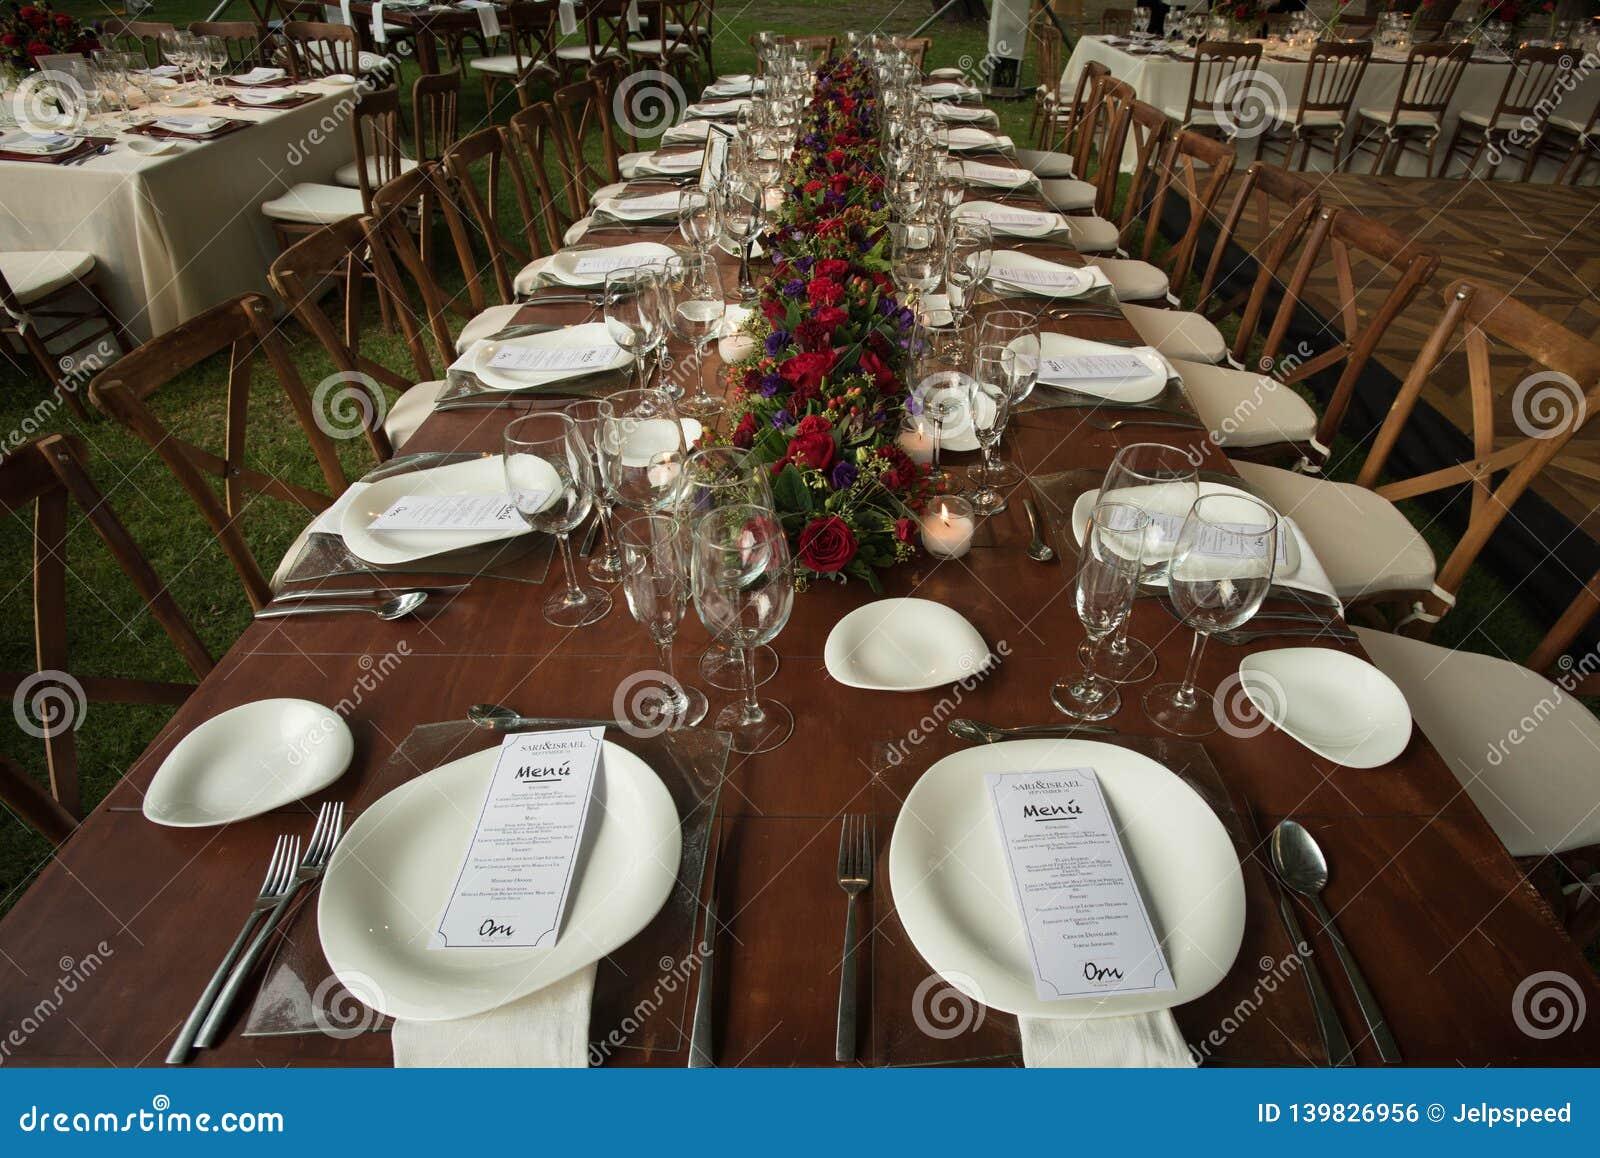 Decoration Elegante De Table De Mariage De Jardin Avec De